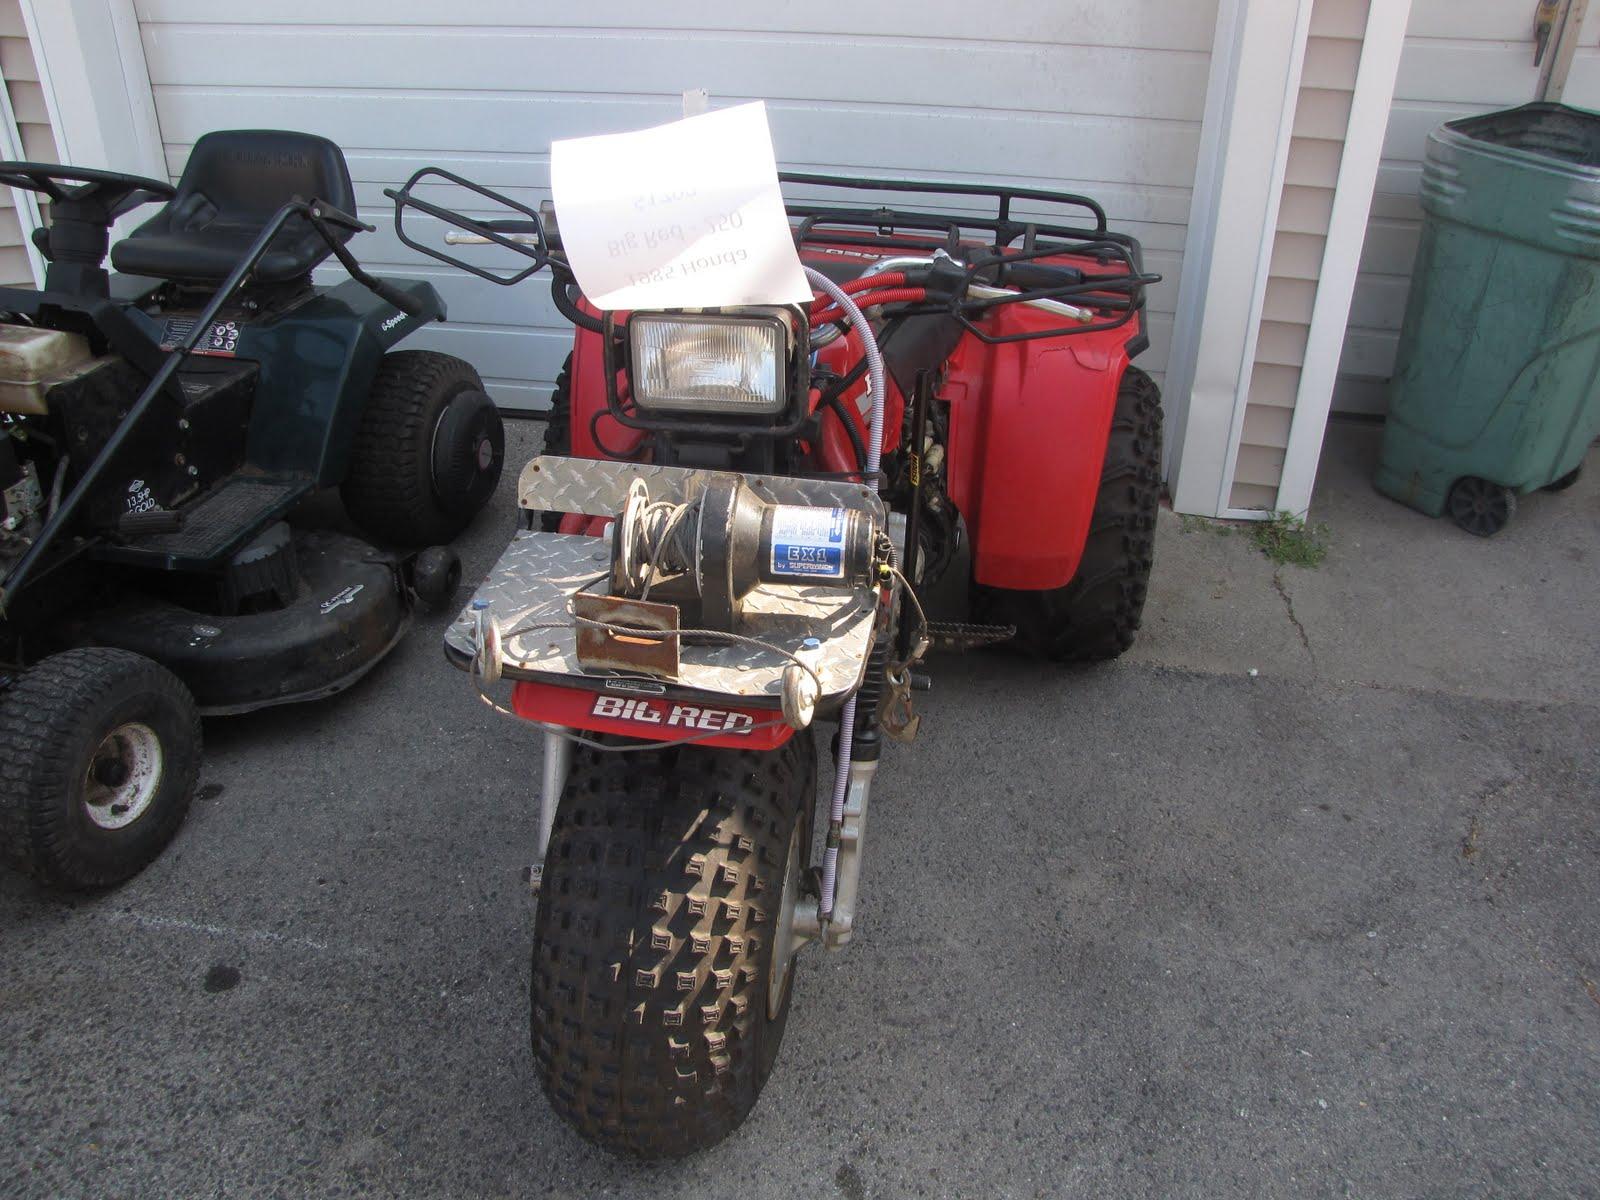 1985 Honda Big Red 250 Trike